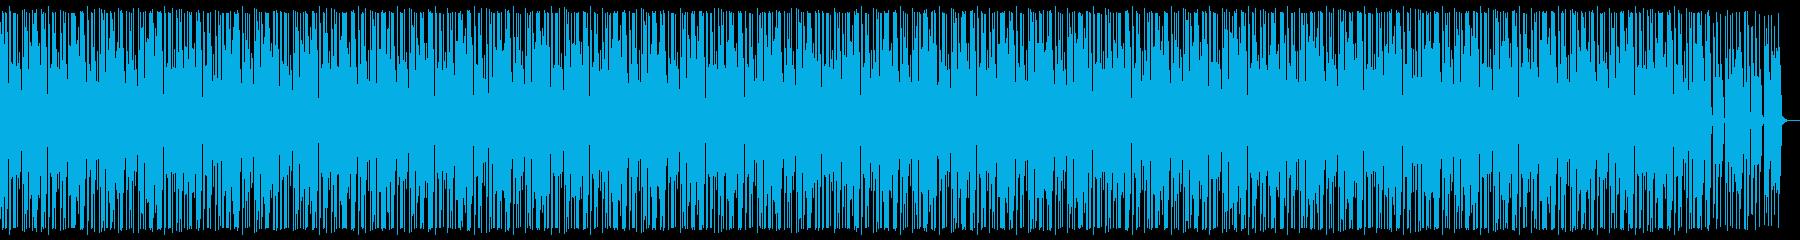 Enjoy Halloween Marimba Dark's reproduced waveform